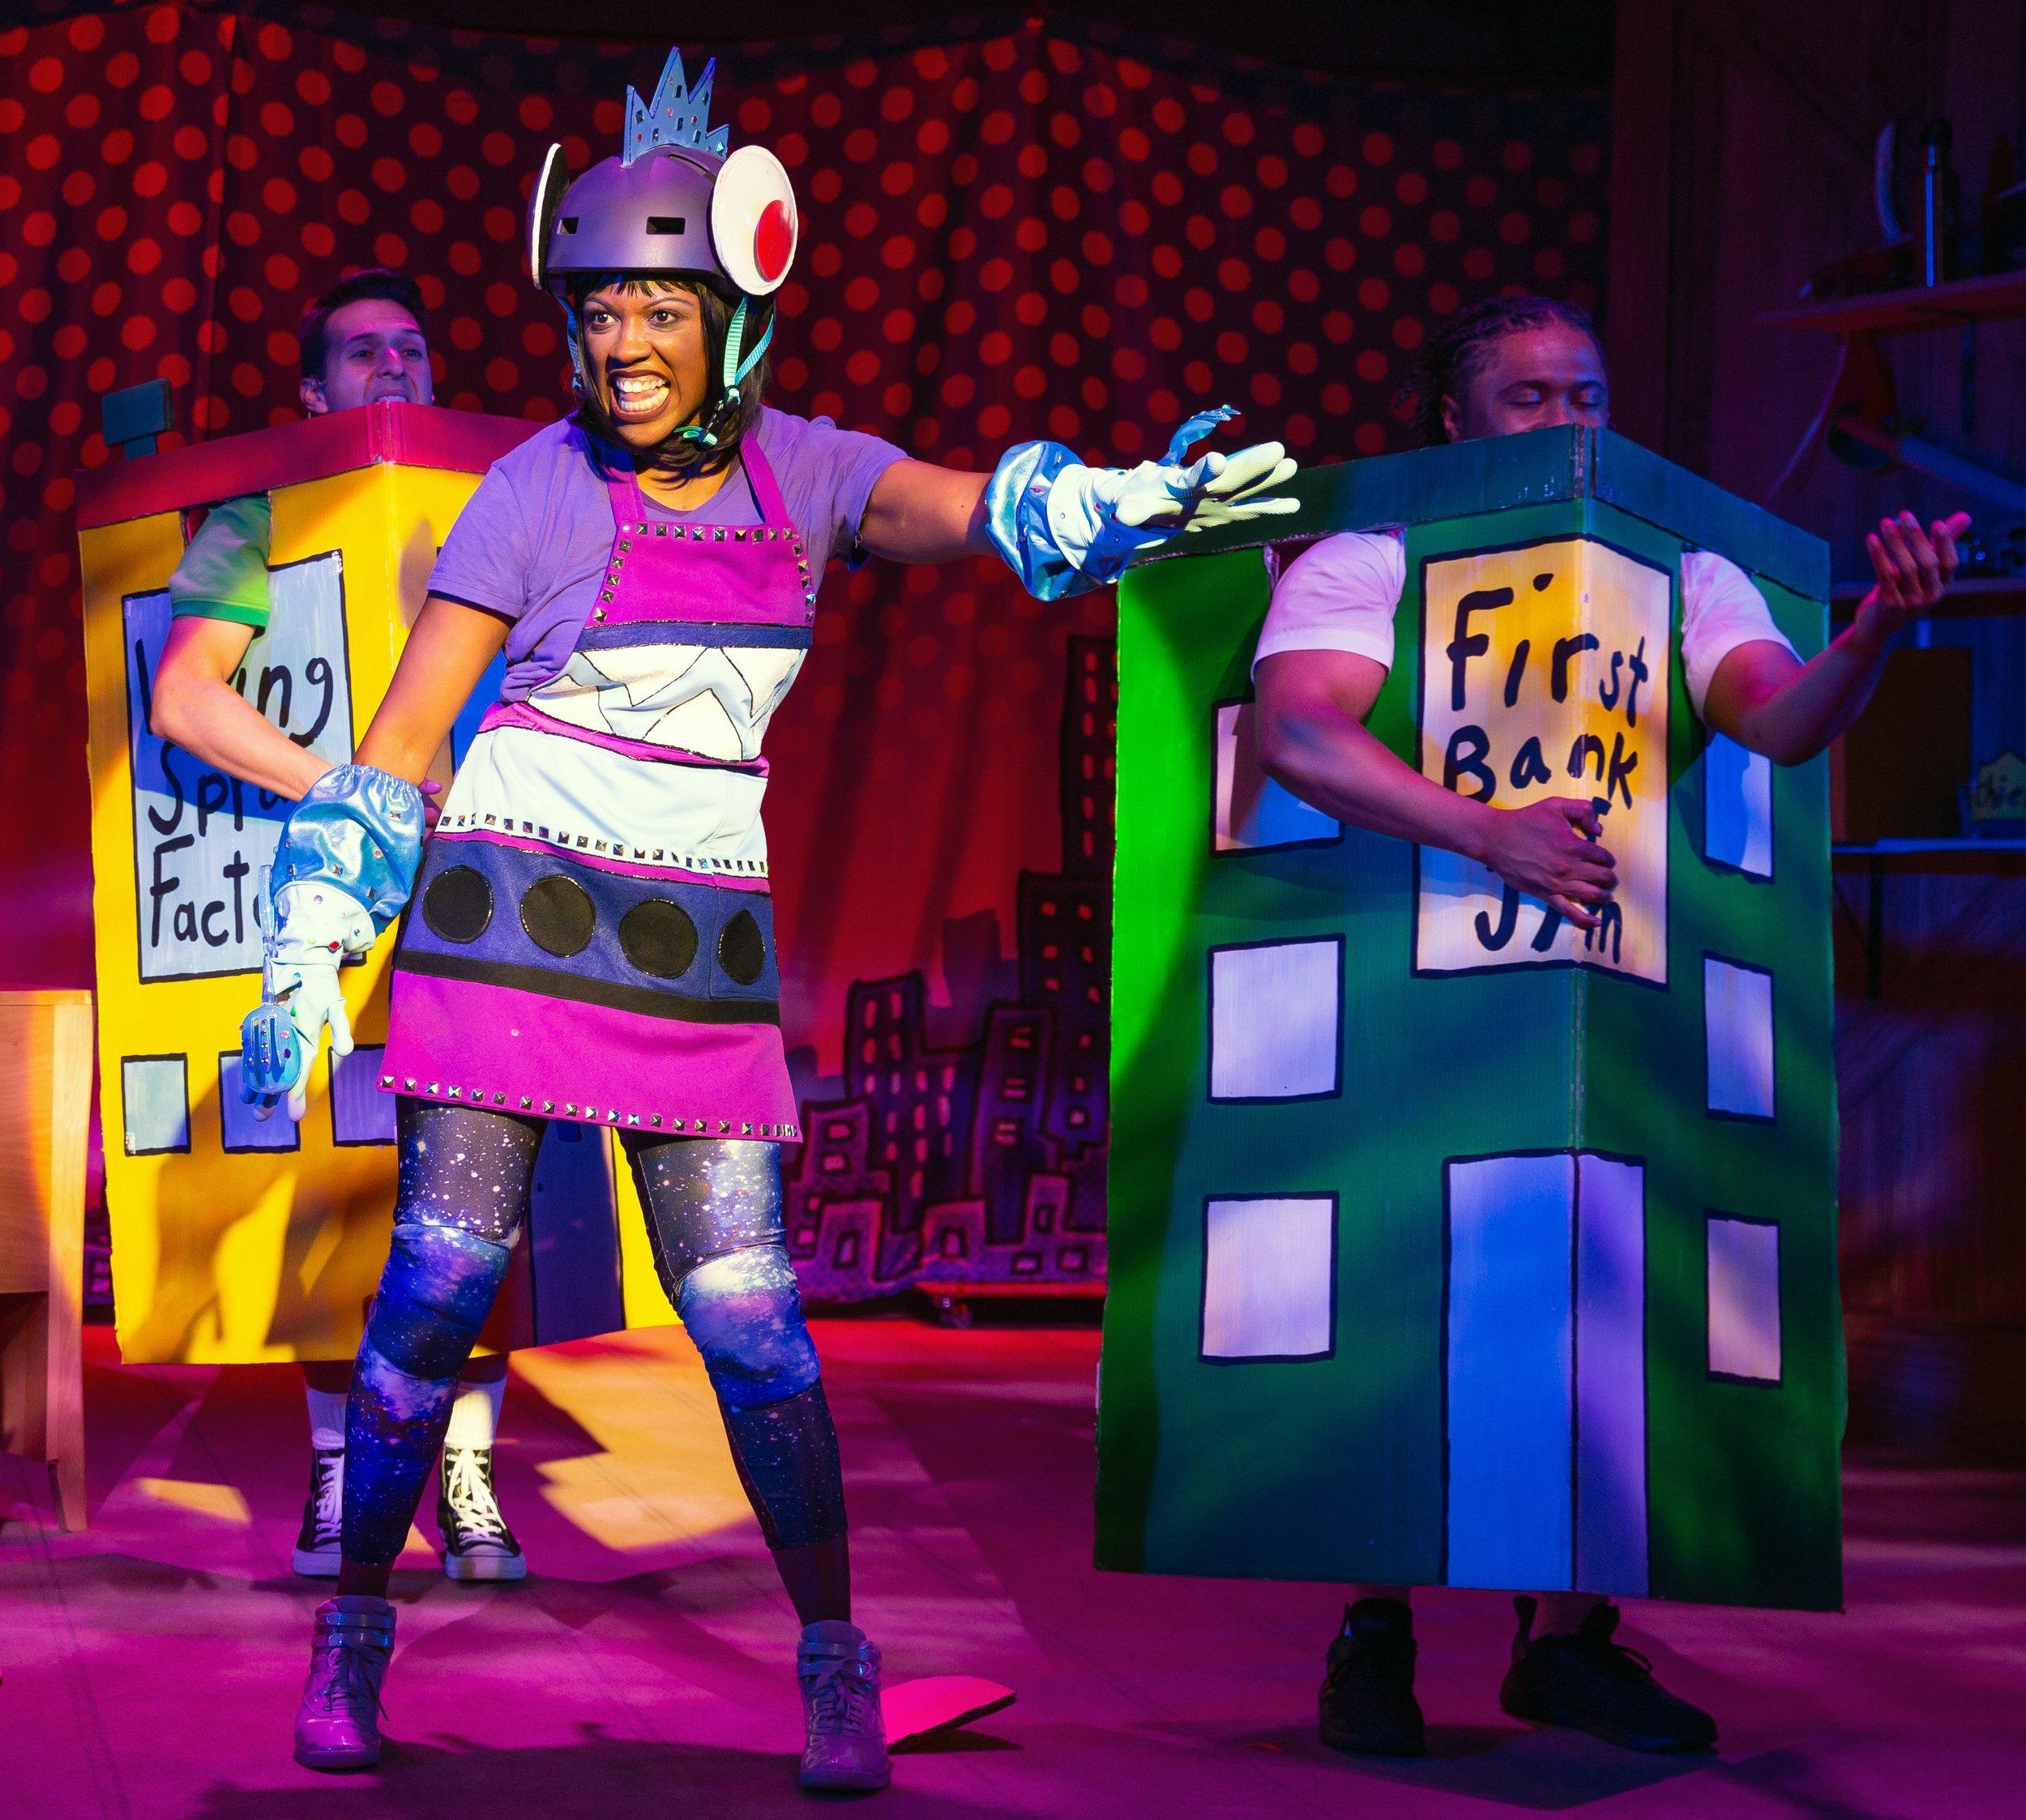 Crystal Sha'nae plays the bionic evildoer Flippy.